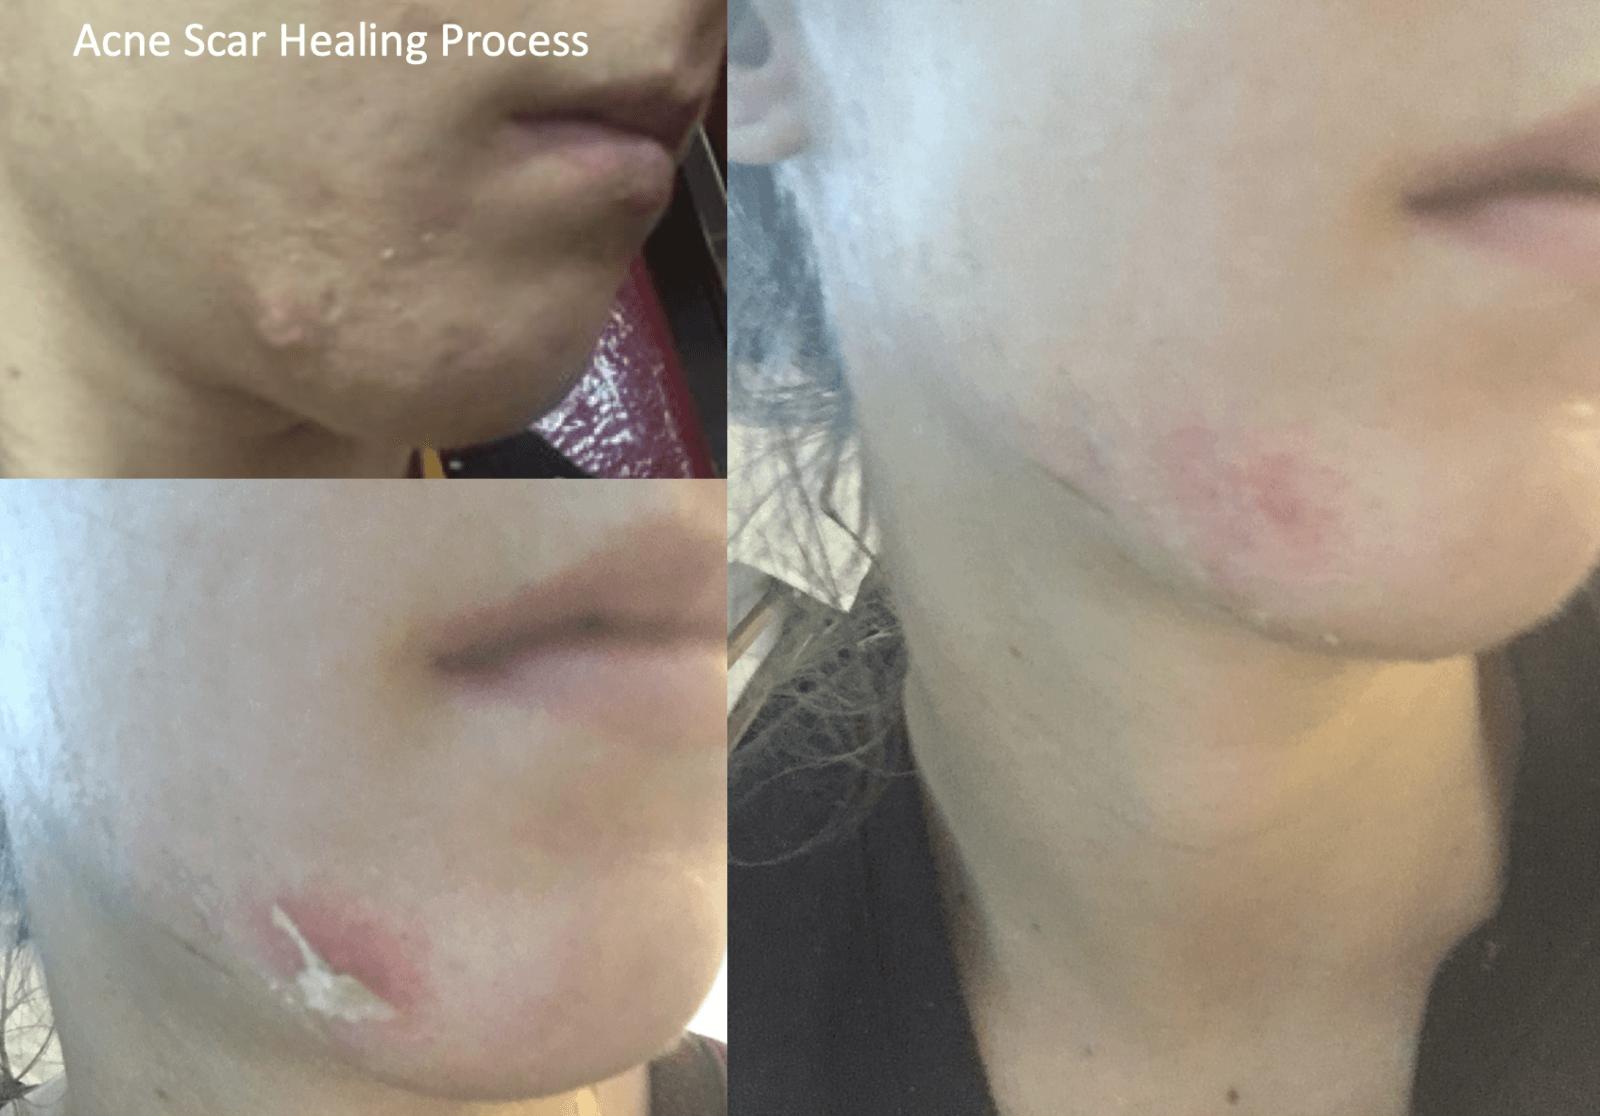 Acne Scar Healing Process